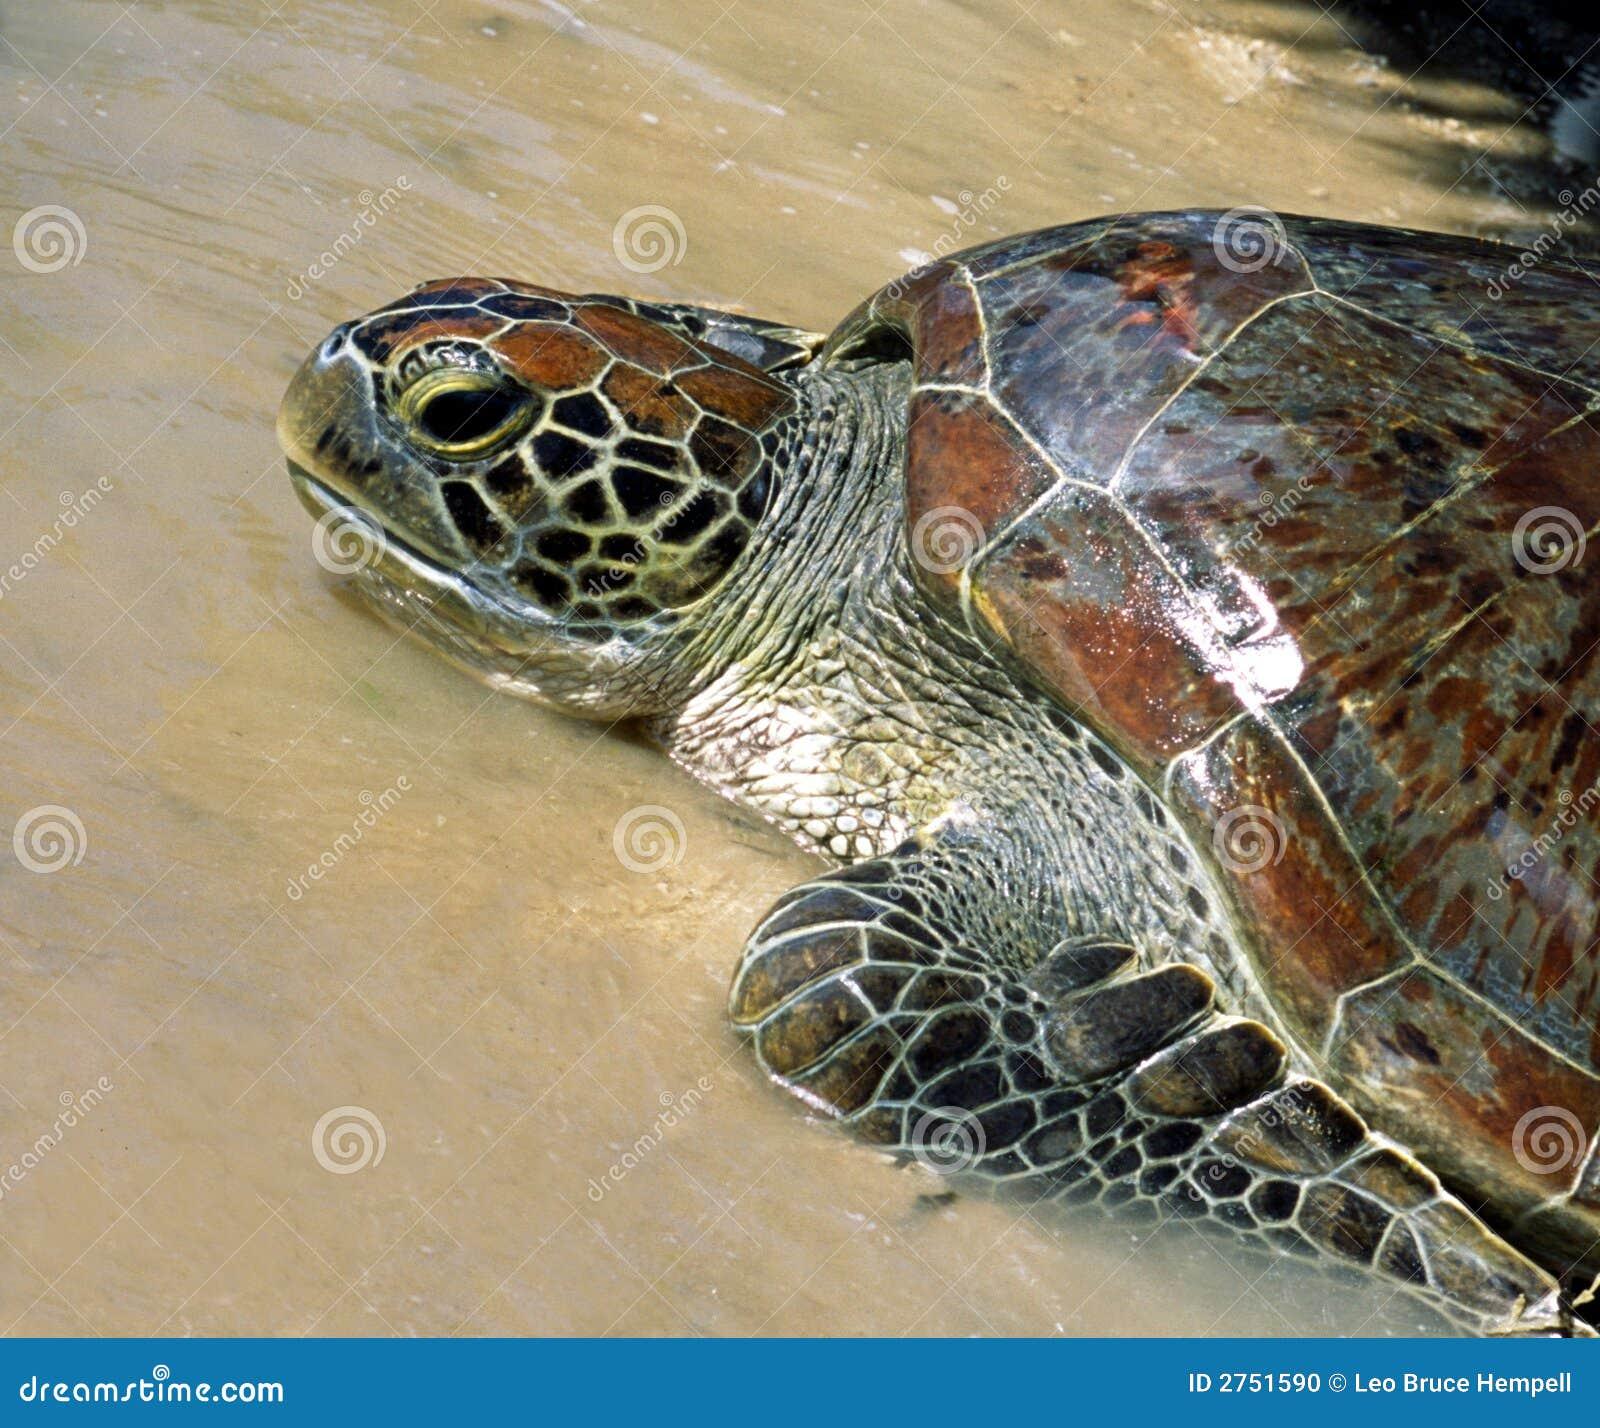 Indonesian Sea Turtle